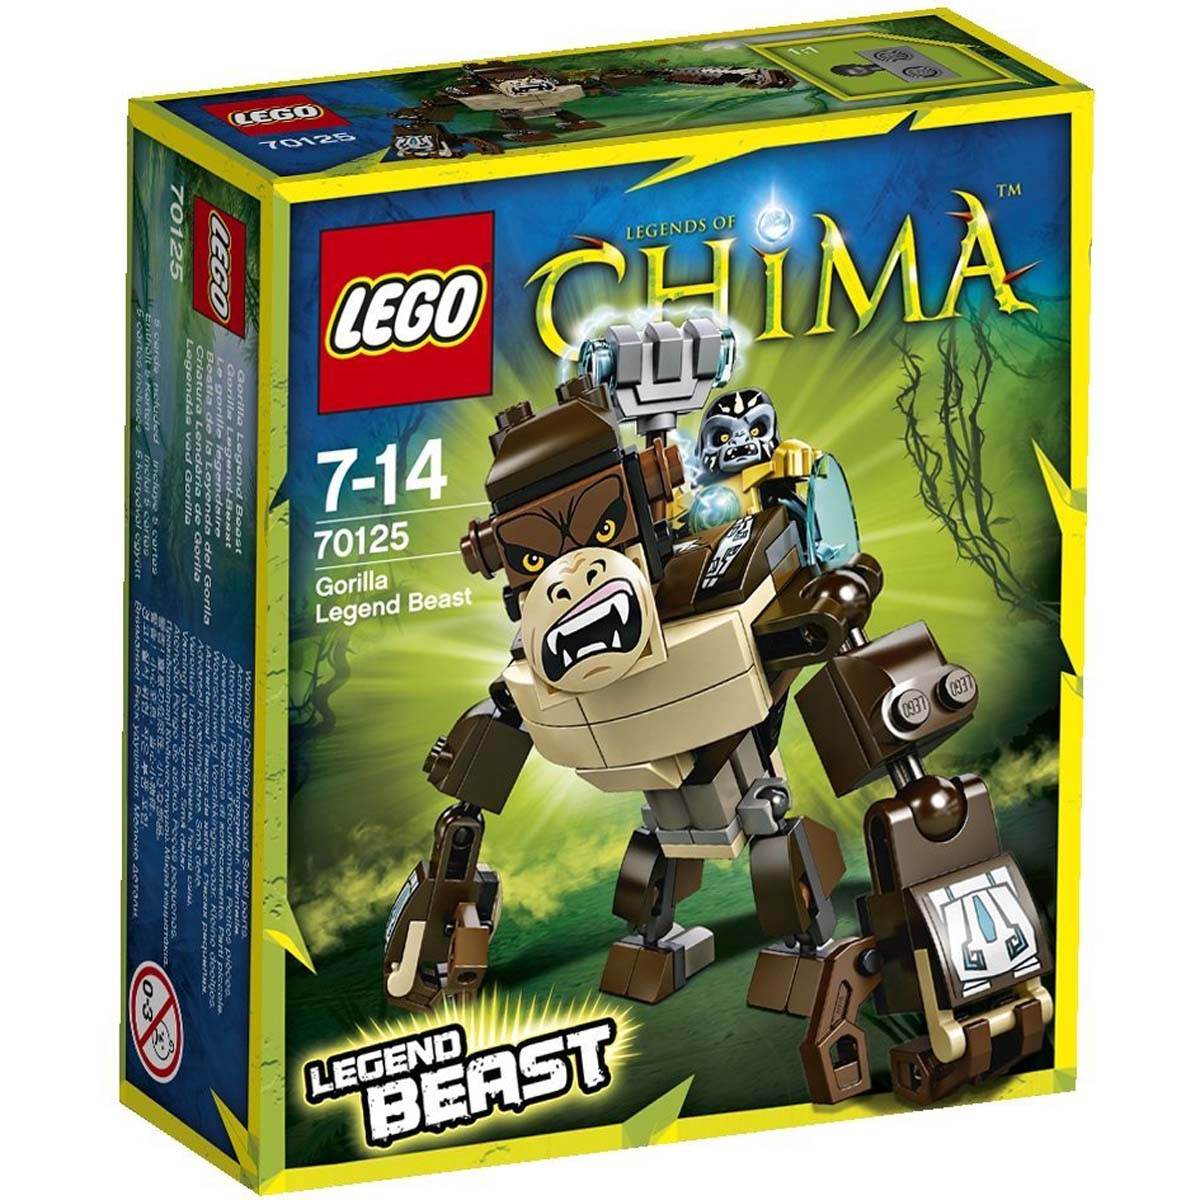 Đồ chơi Lego Chima Gorilla Legend Beast 70125 – Khỉ đột huyền thoại